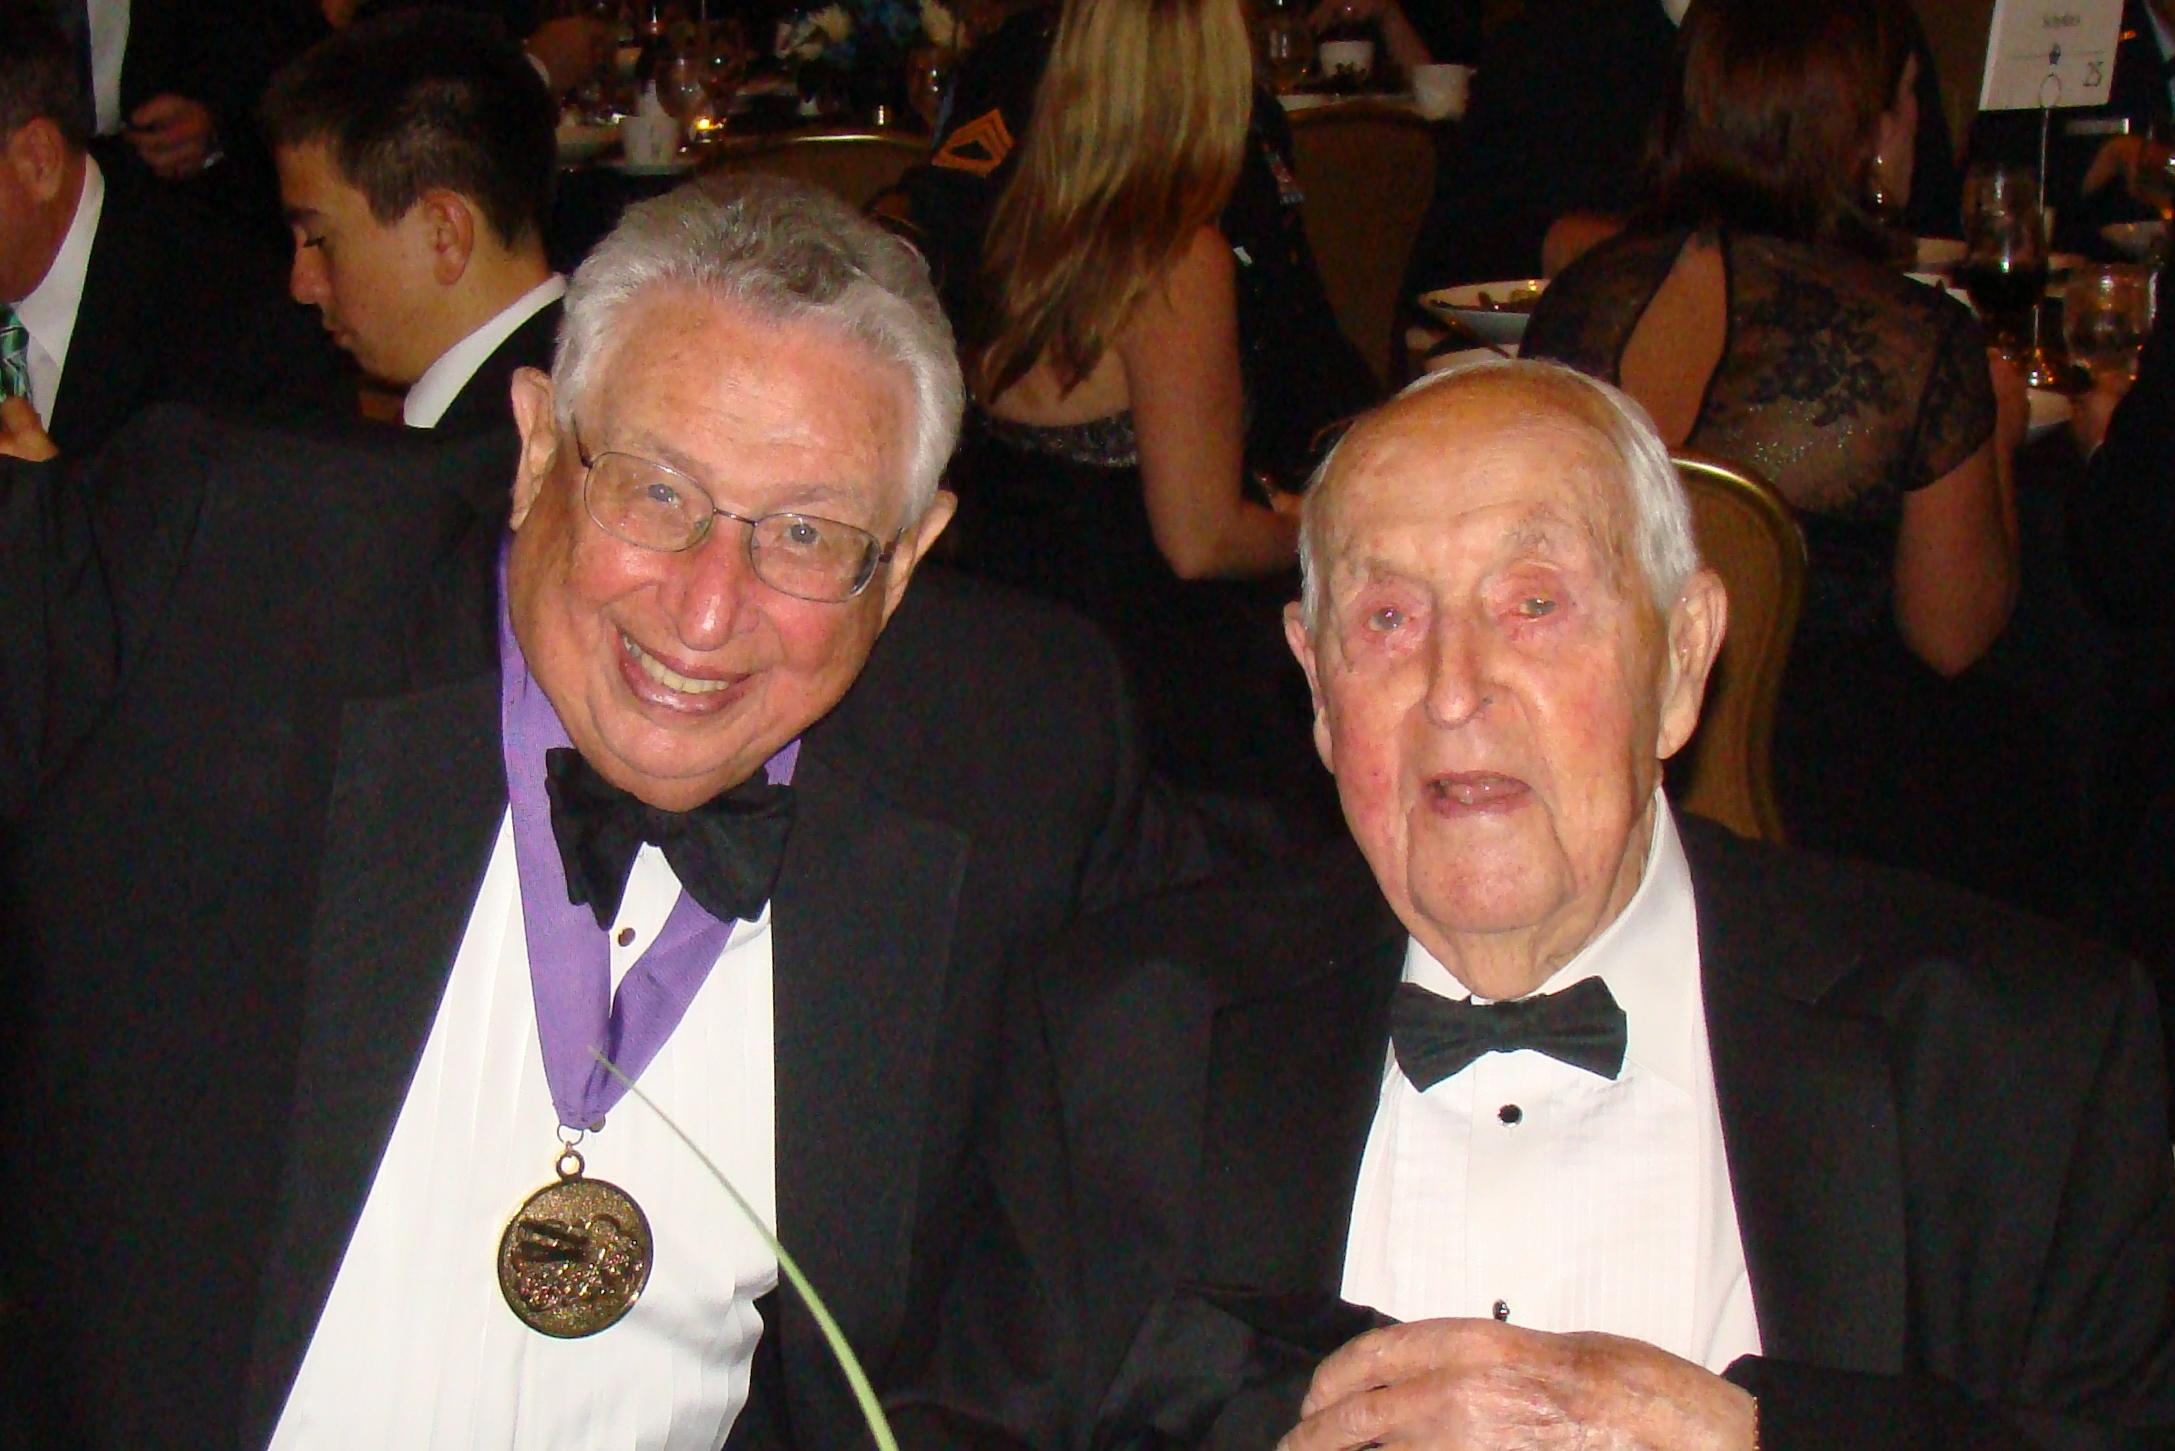 Edwin Colodny & Sir Lenox Hewitt - 1, 15 Nov '13.JPG